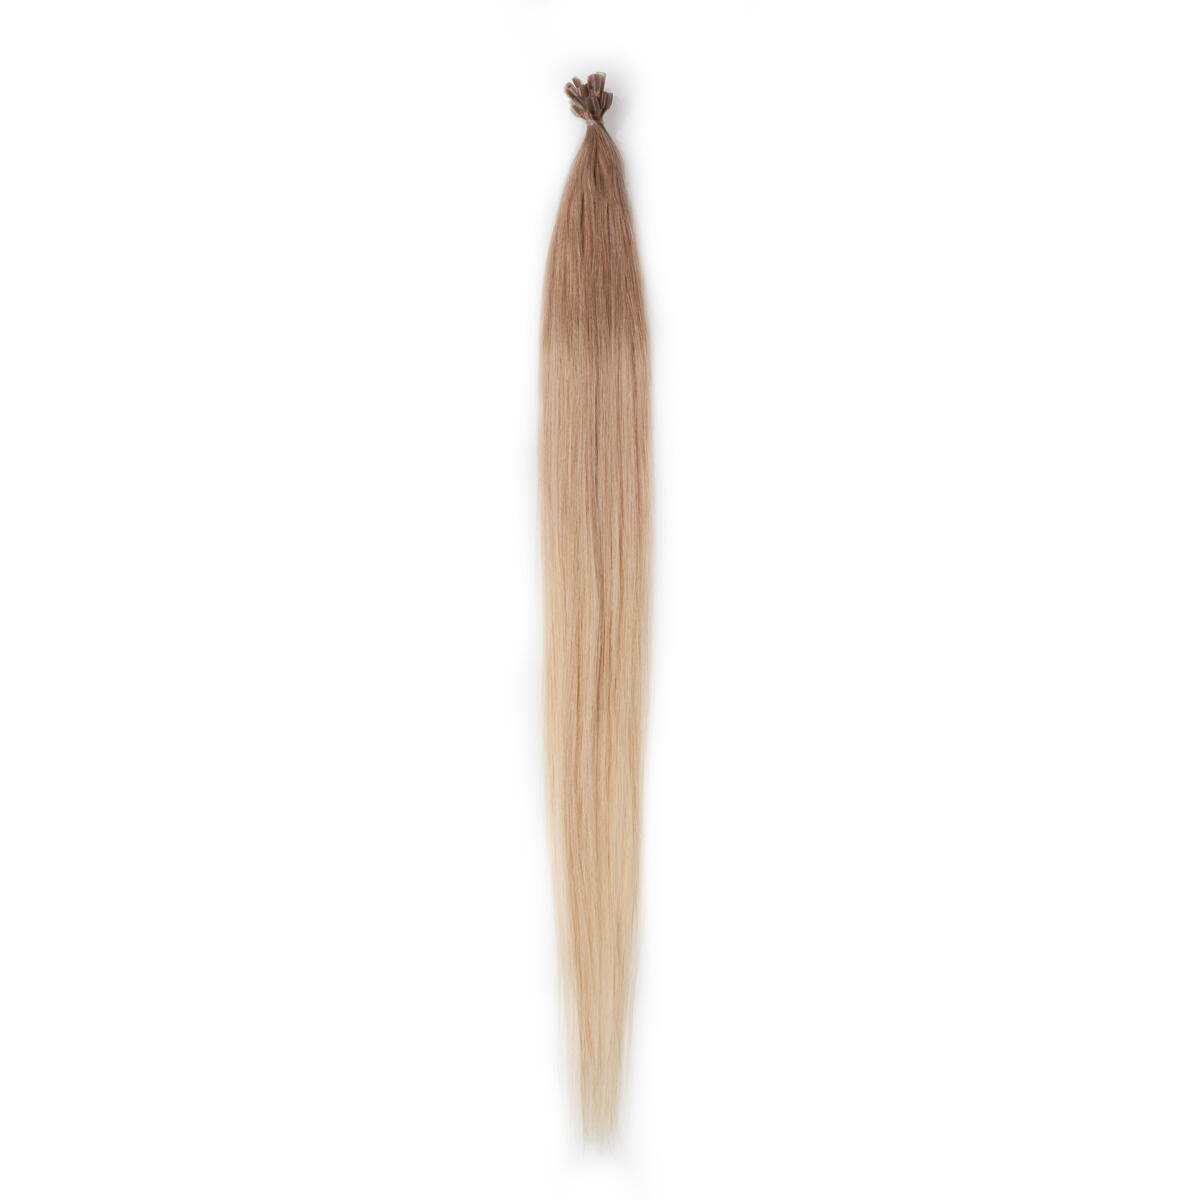 Nail Hair O7.5/8.3 Golden Blond Ombre 50 cm